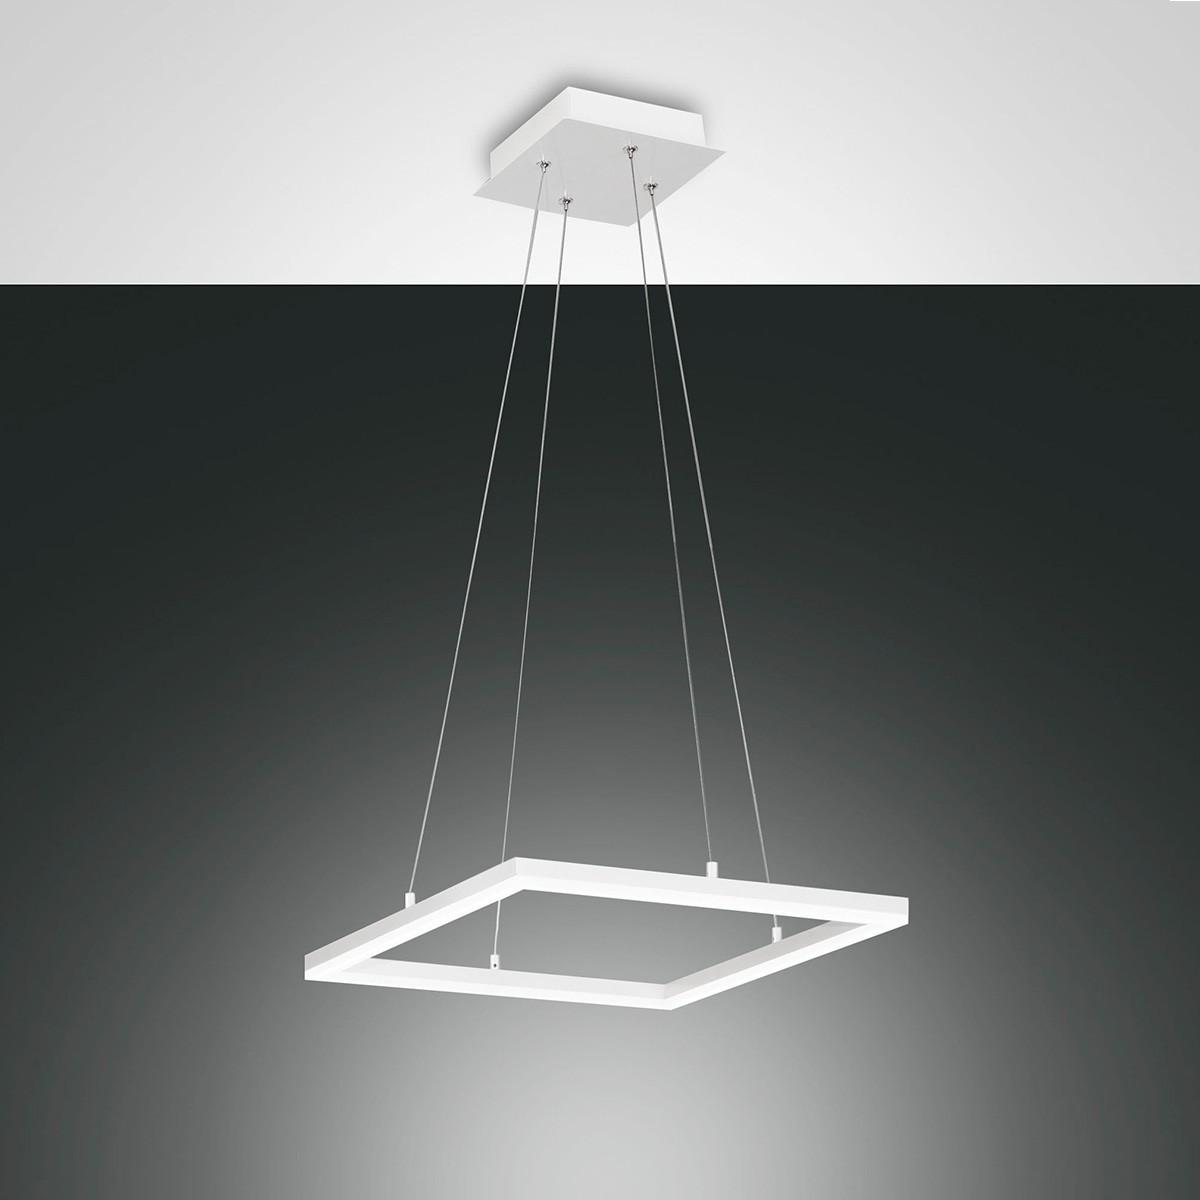 Fabas Luce Bard LED Pendelleuchte, quadratisch, weiß